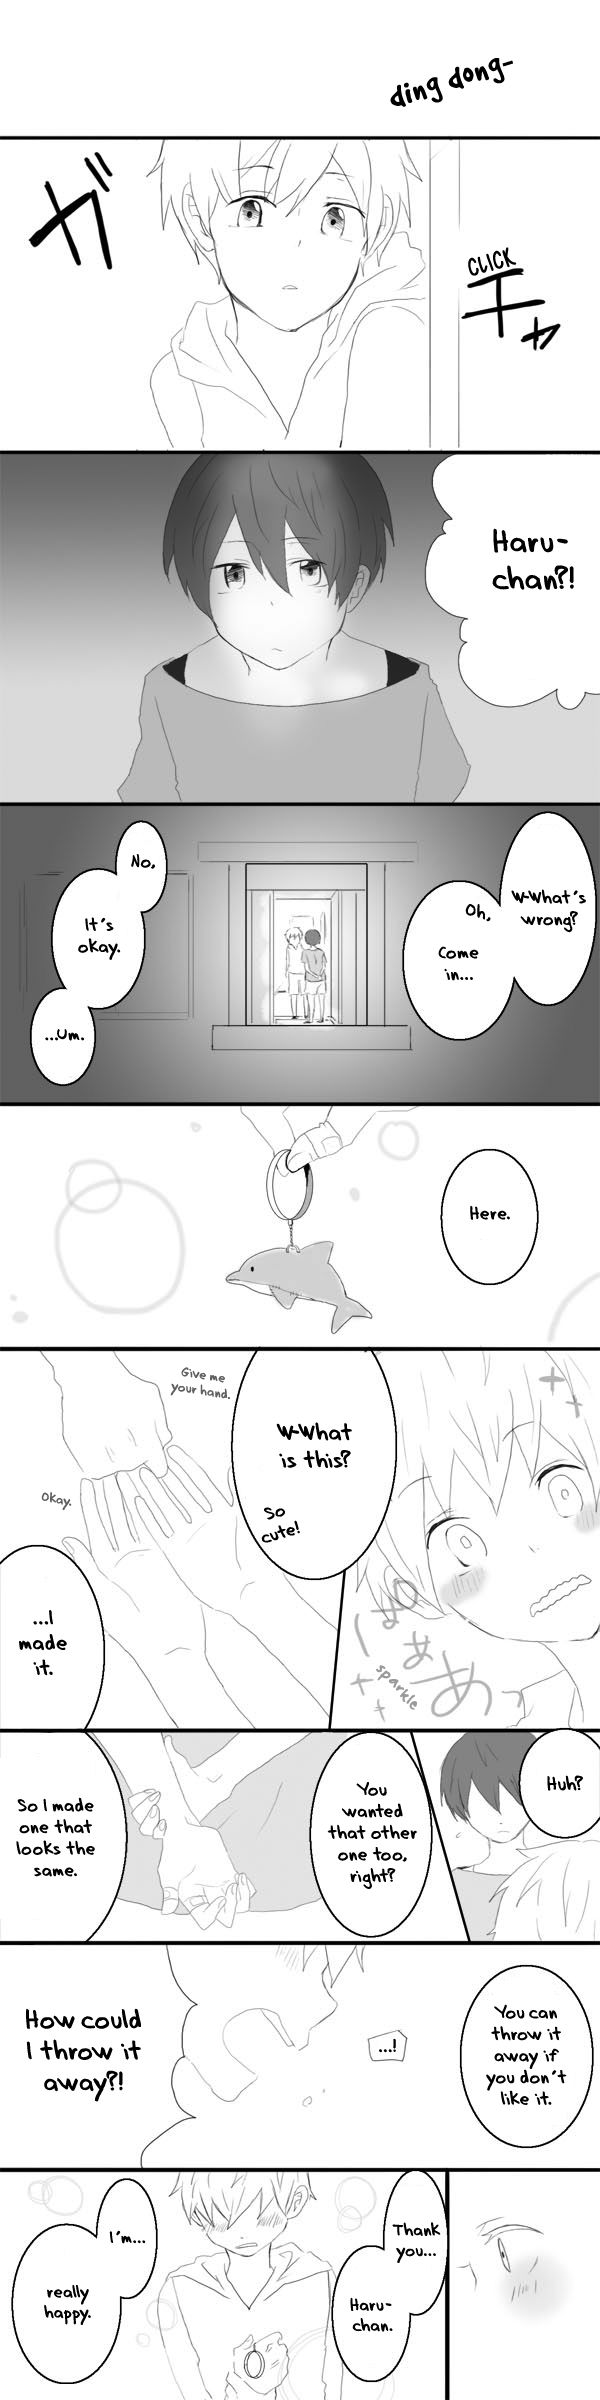 Mako's treasure ... Part 3 ... Found on reader.iron-star.net ... Free! - Iwatobi Swim Club, haruka nanase, haru nanase, haru, free!, iwatobi, makoto tachibana, makoto, tachibana, nanase